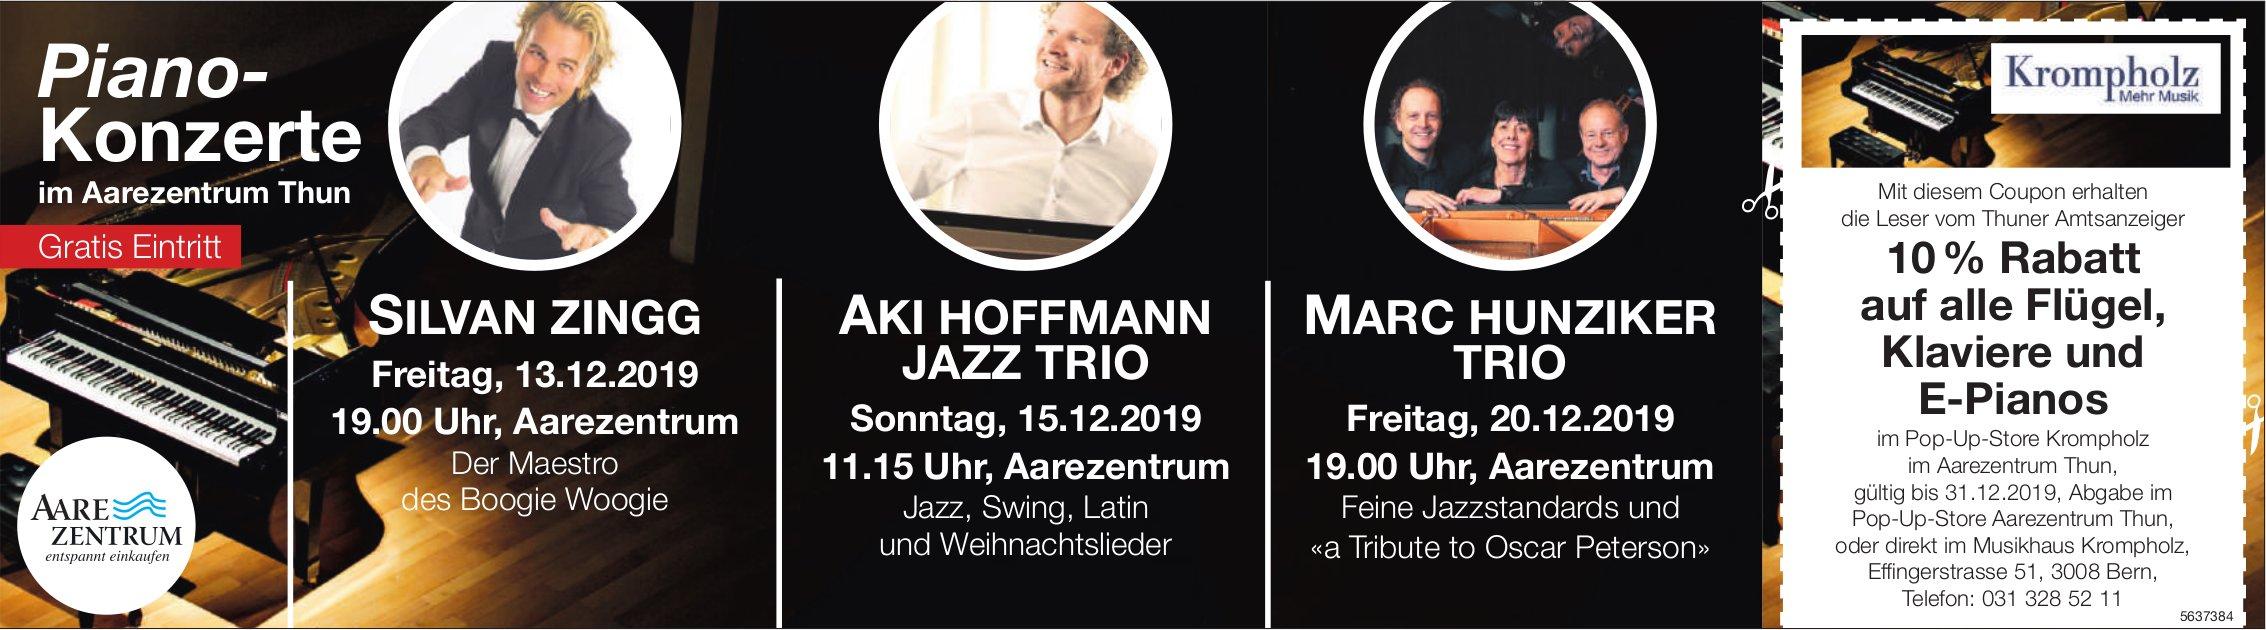 Piano-Konzerte, 13./15. + 20. Dezember im Aarezentrum Thun